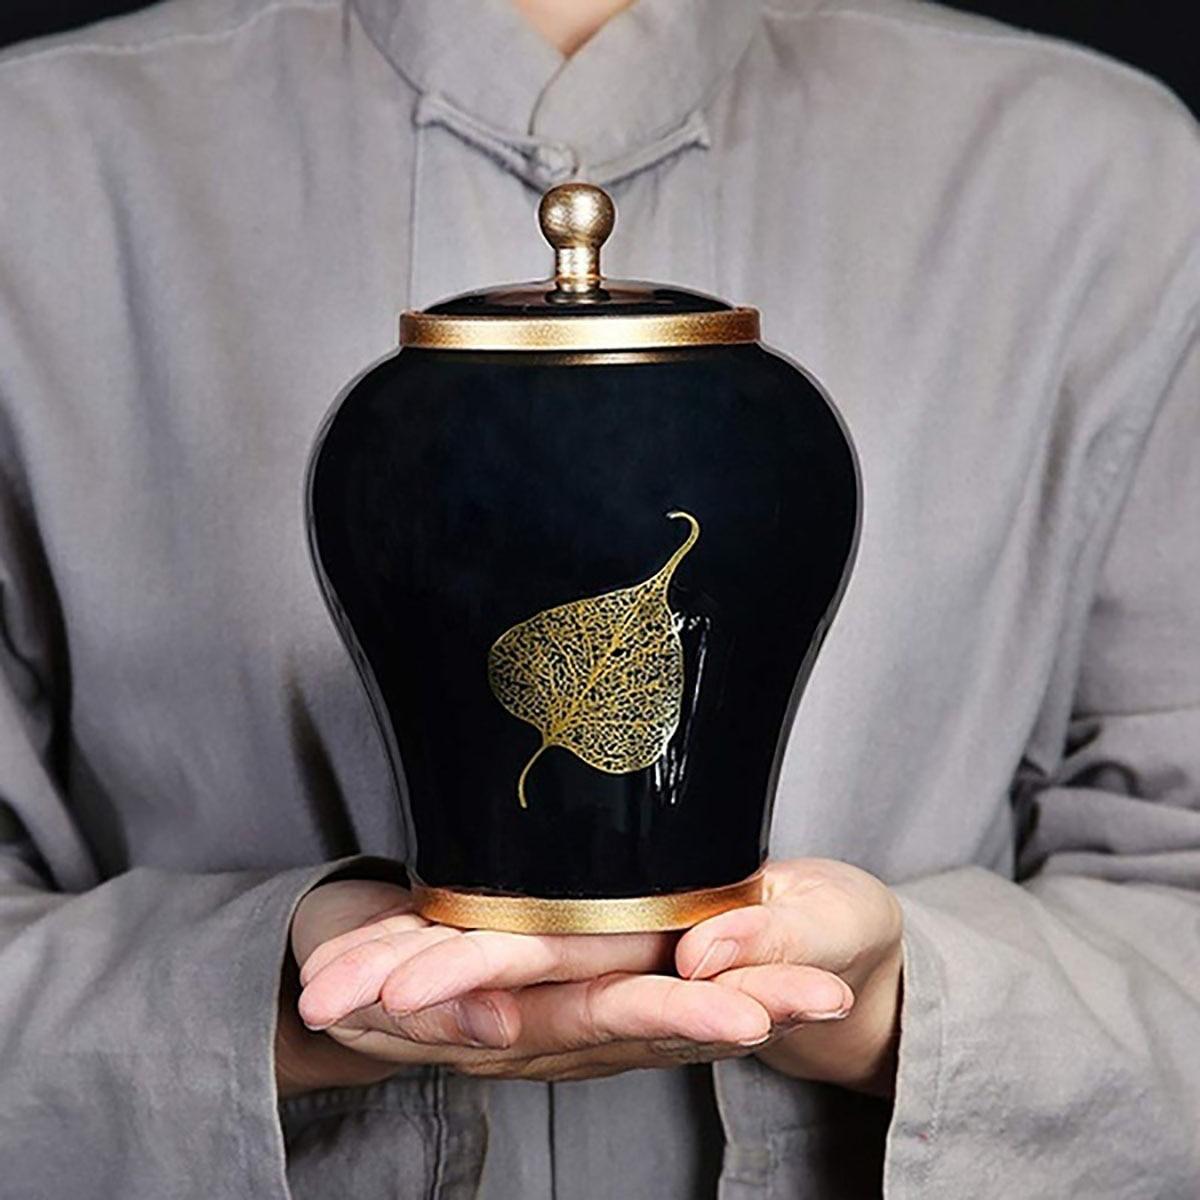 Luxurious Pet Cremation Ceramics Memorial Urn Jar For Dog Cat Bird Mouse Ashes Keepsake Storage Box